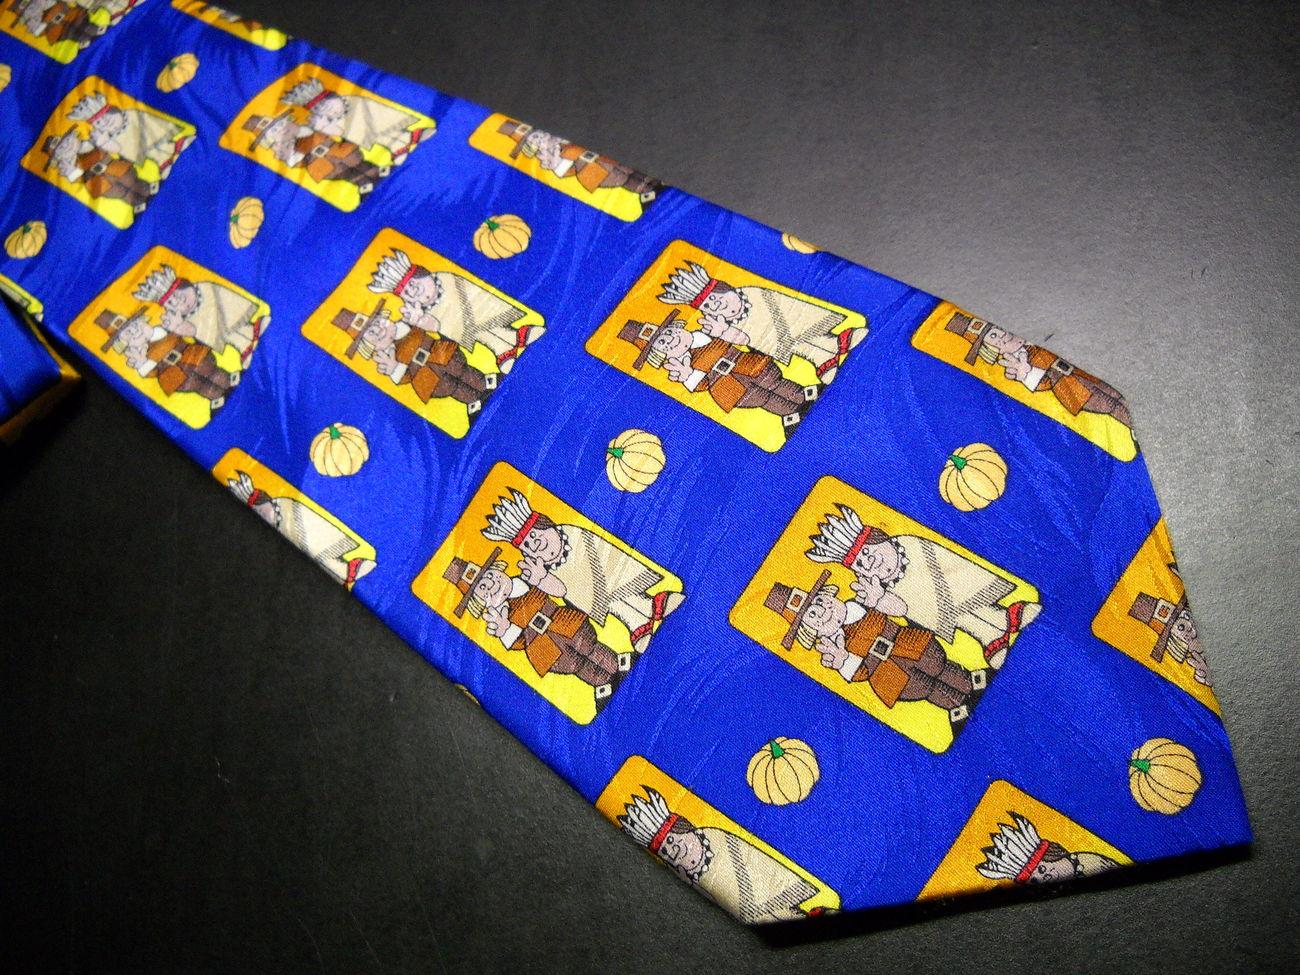 Tie keith daniels thanksgivings theme blue 02